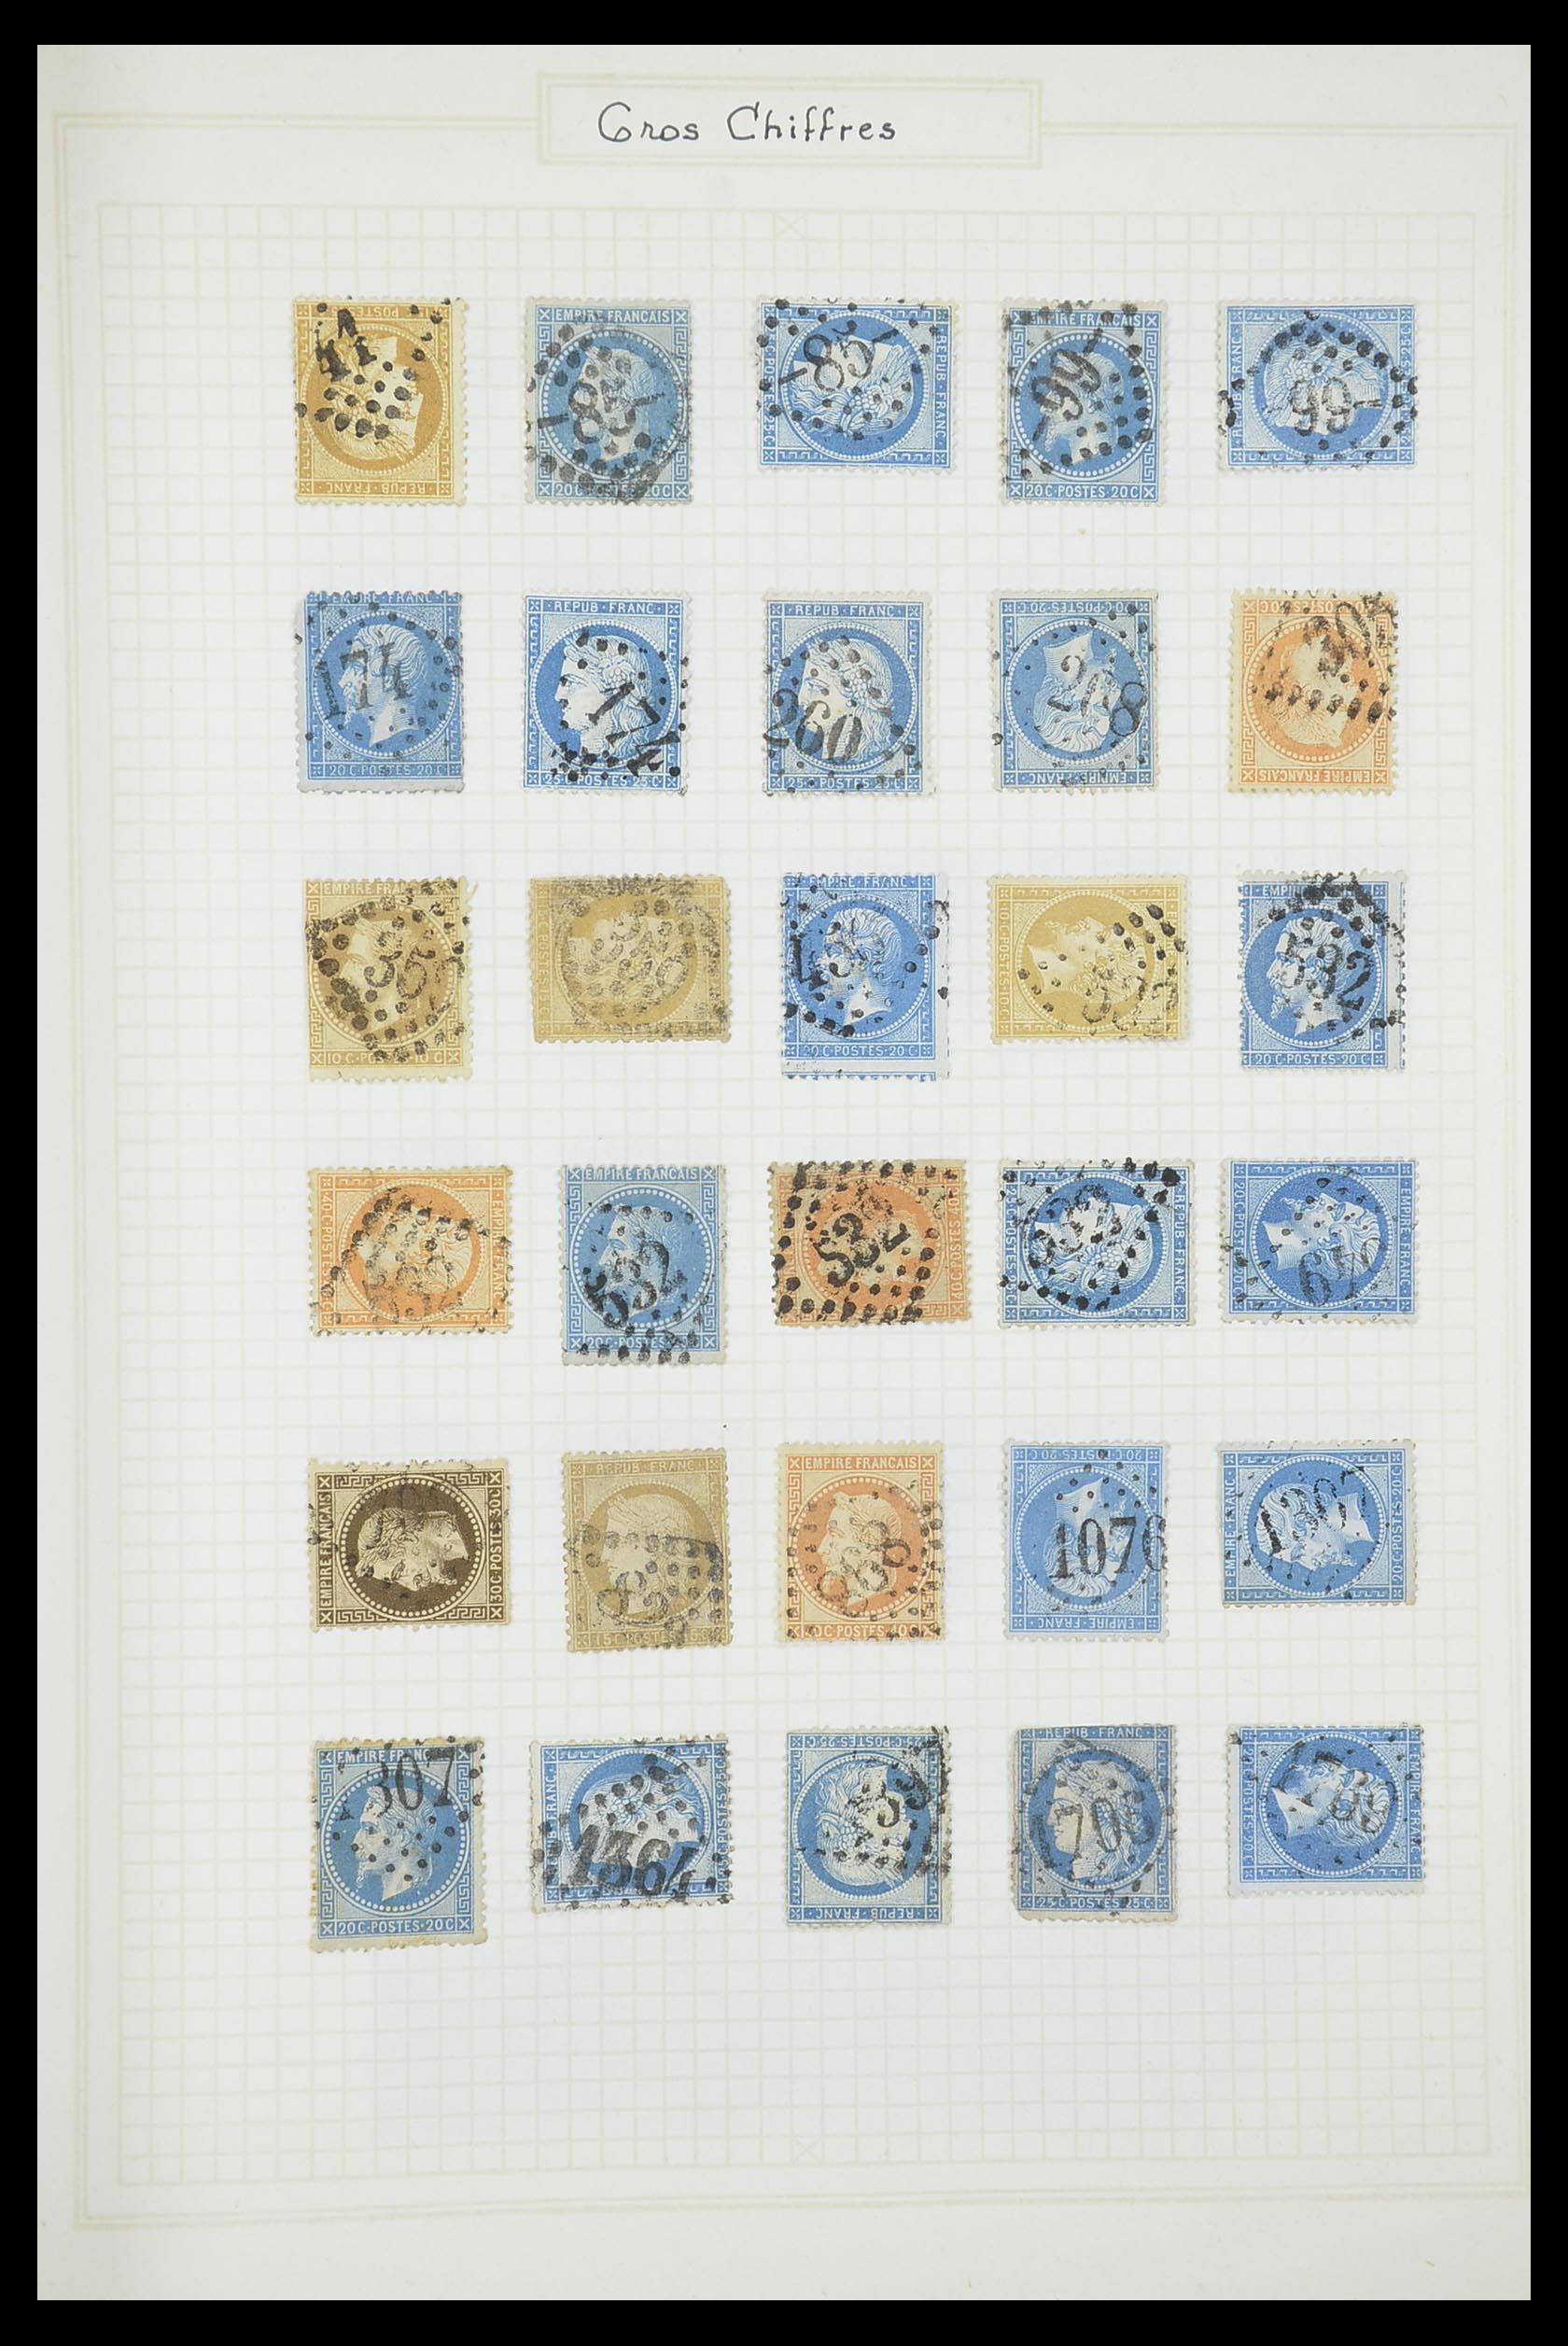 33851 011 - Postzegelverzameling 33851 Frankrijk klassiek stempels.